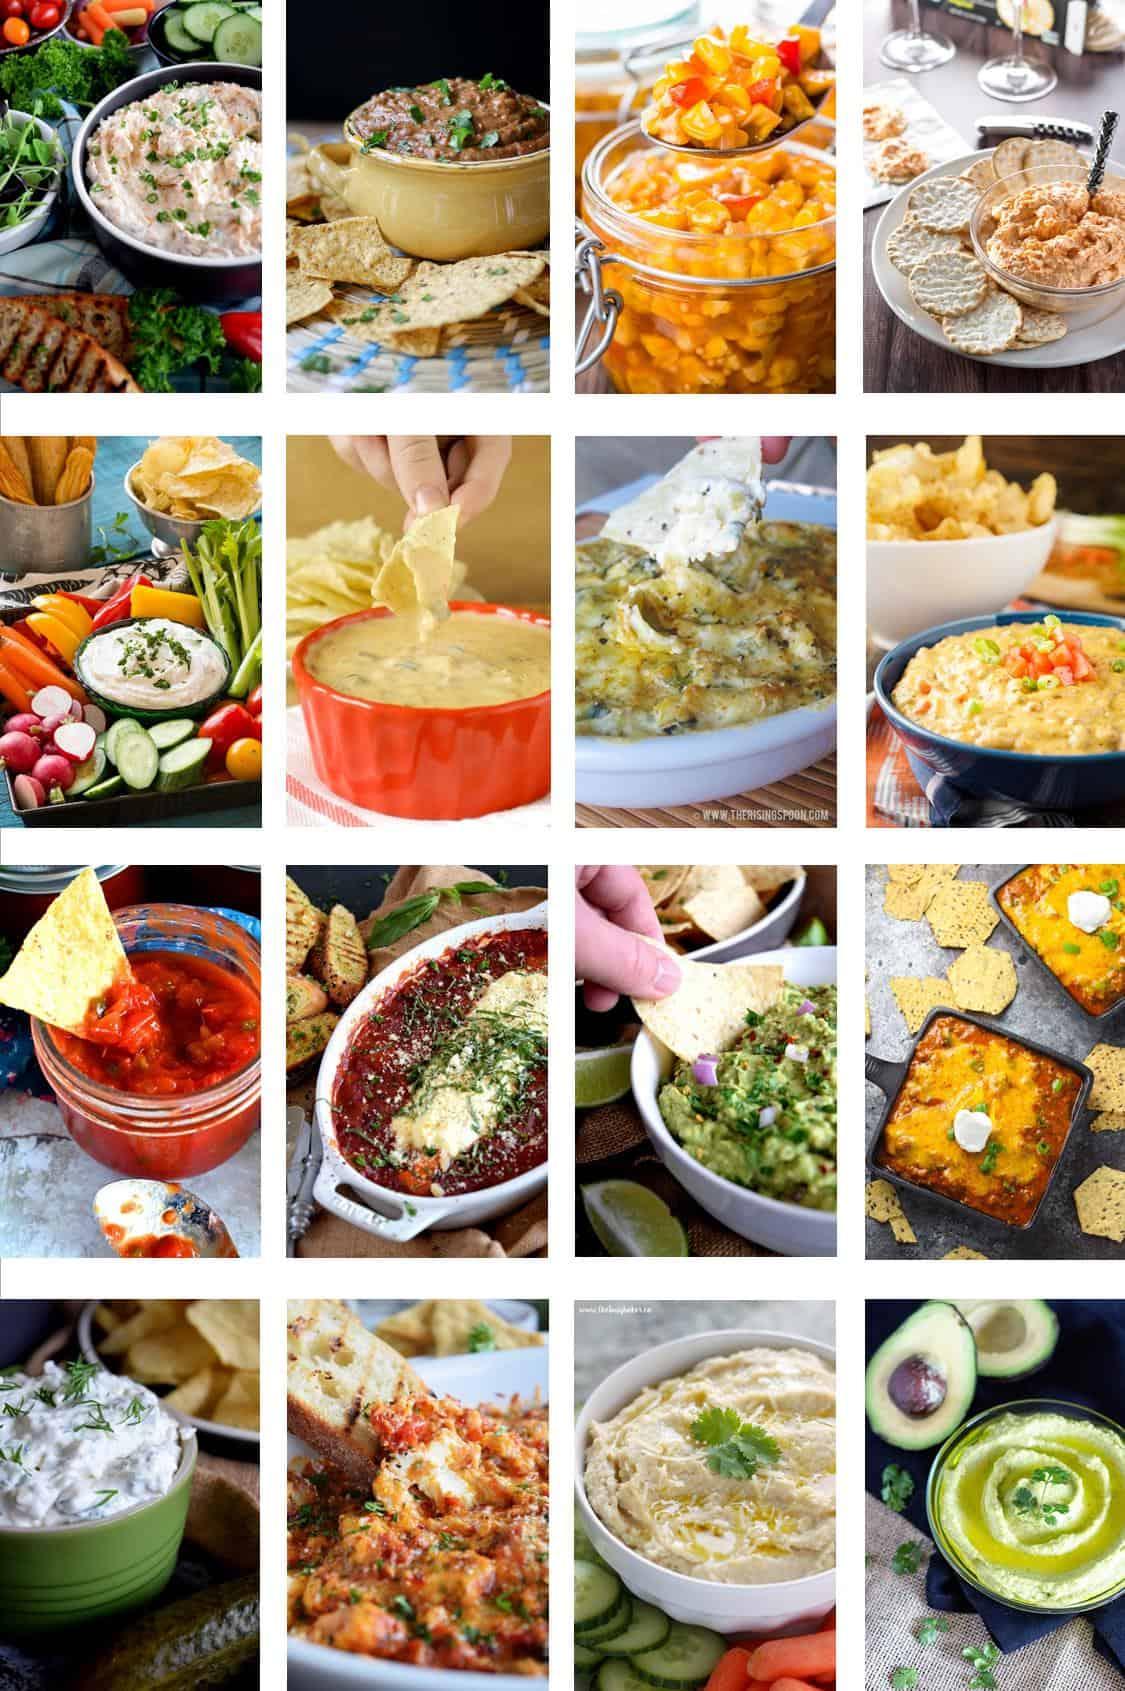 22 Delicious Dips